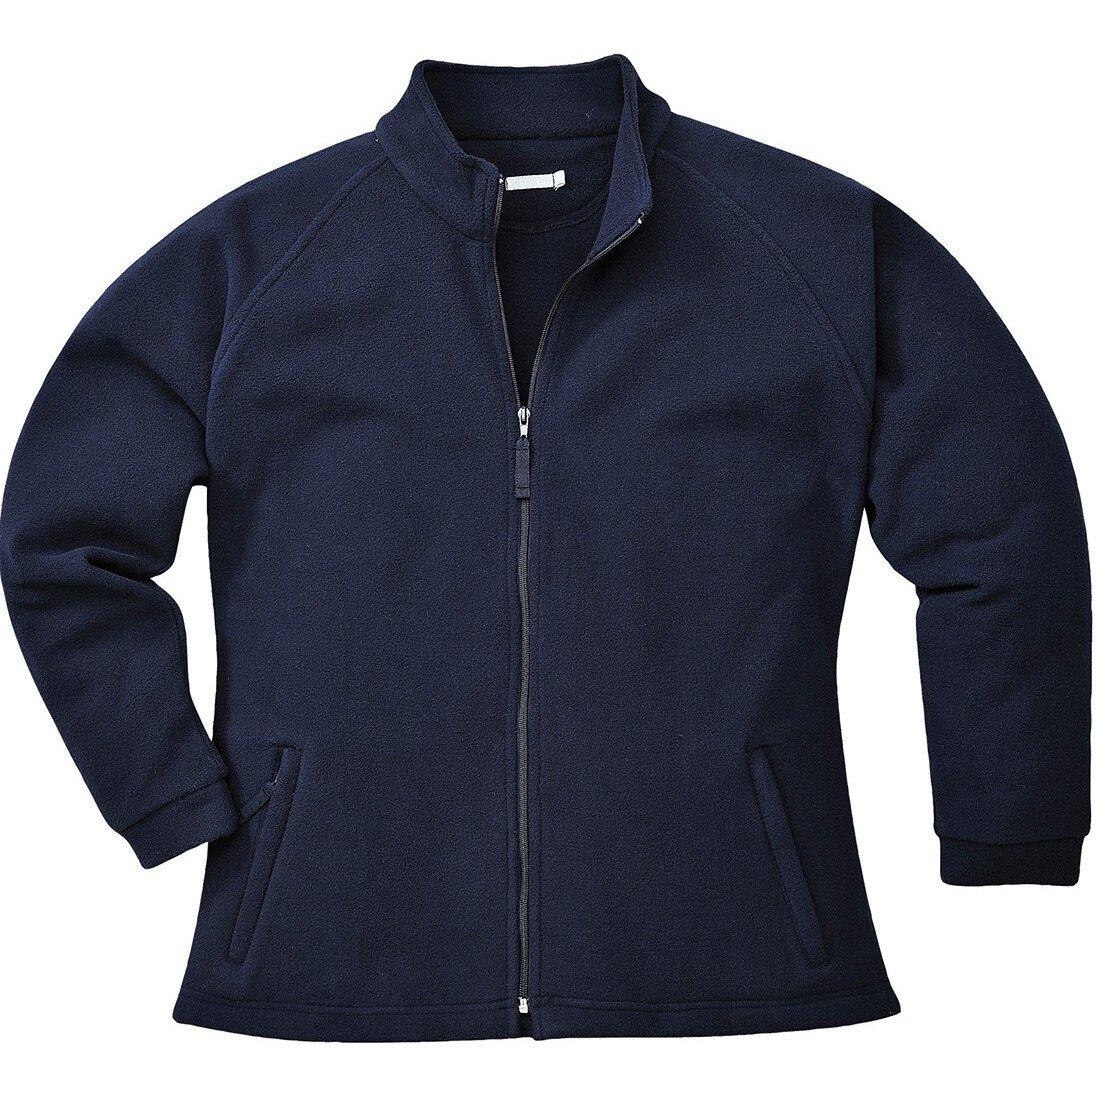 Portwest F282 Aran Ladies Rainwear Fleece - Various Colours Available